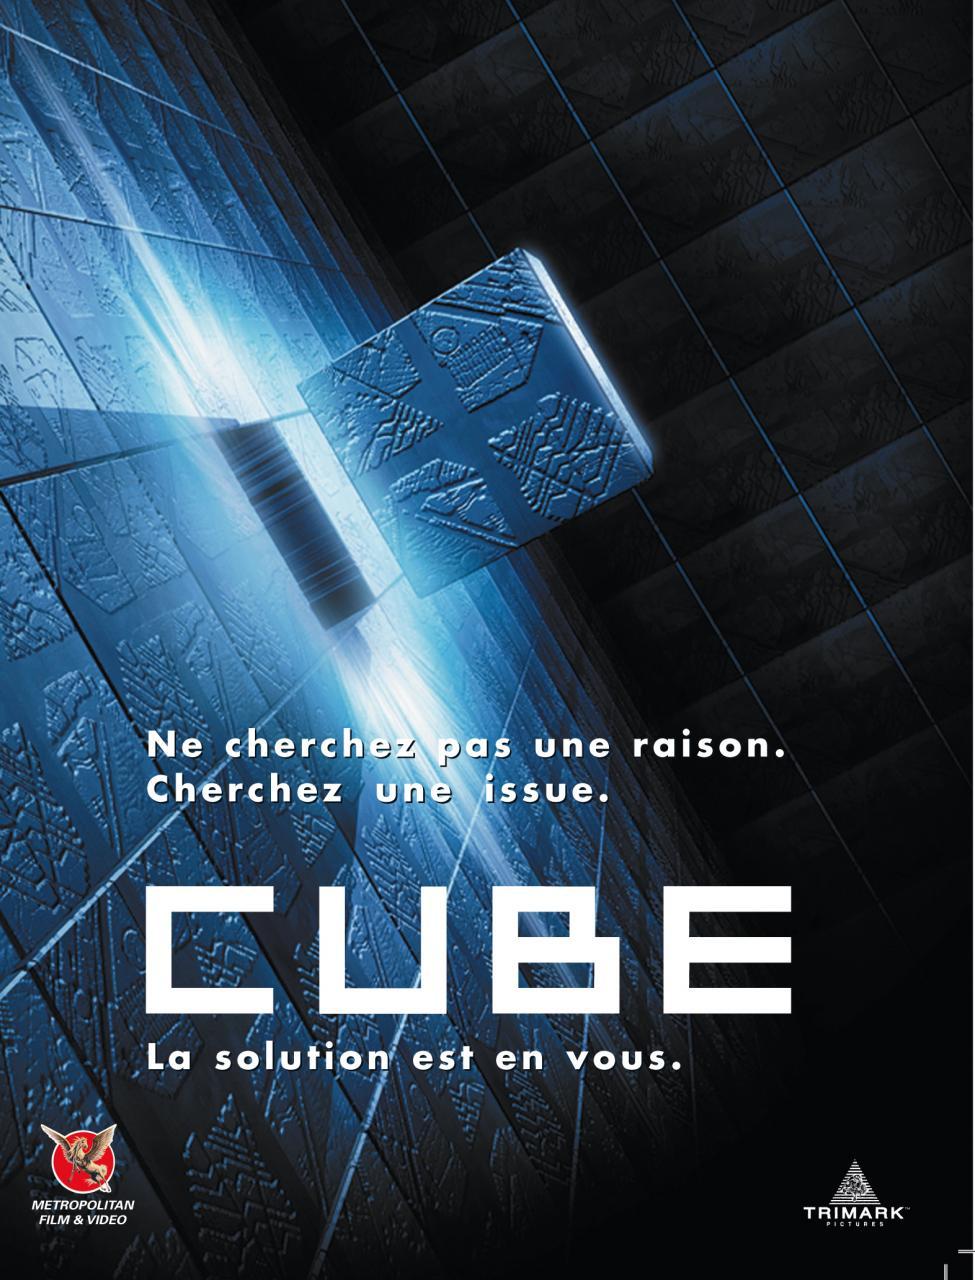 [Jeu] Association d'images - Page 20 Cube%201997%20BluRay%20720p%20DTS%20x264%20CHD